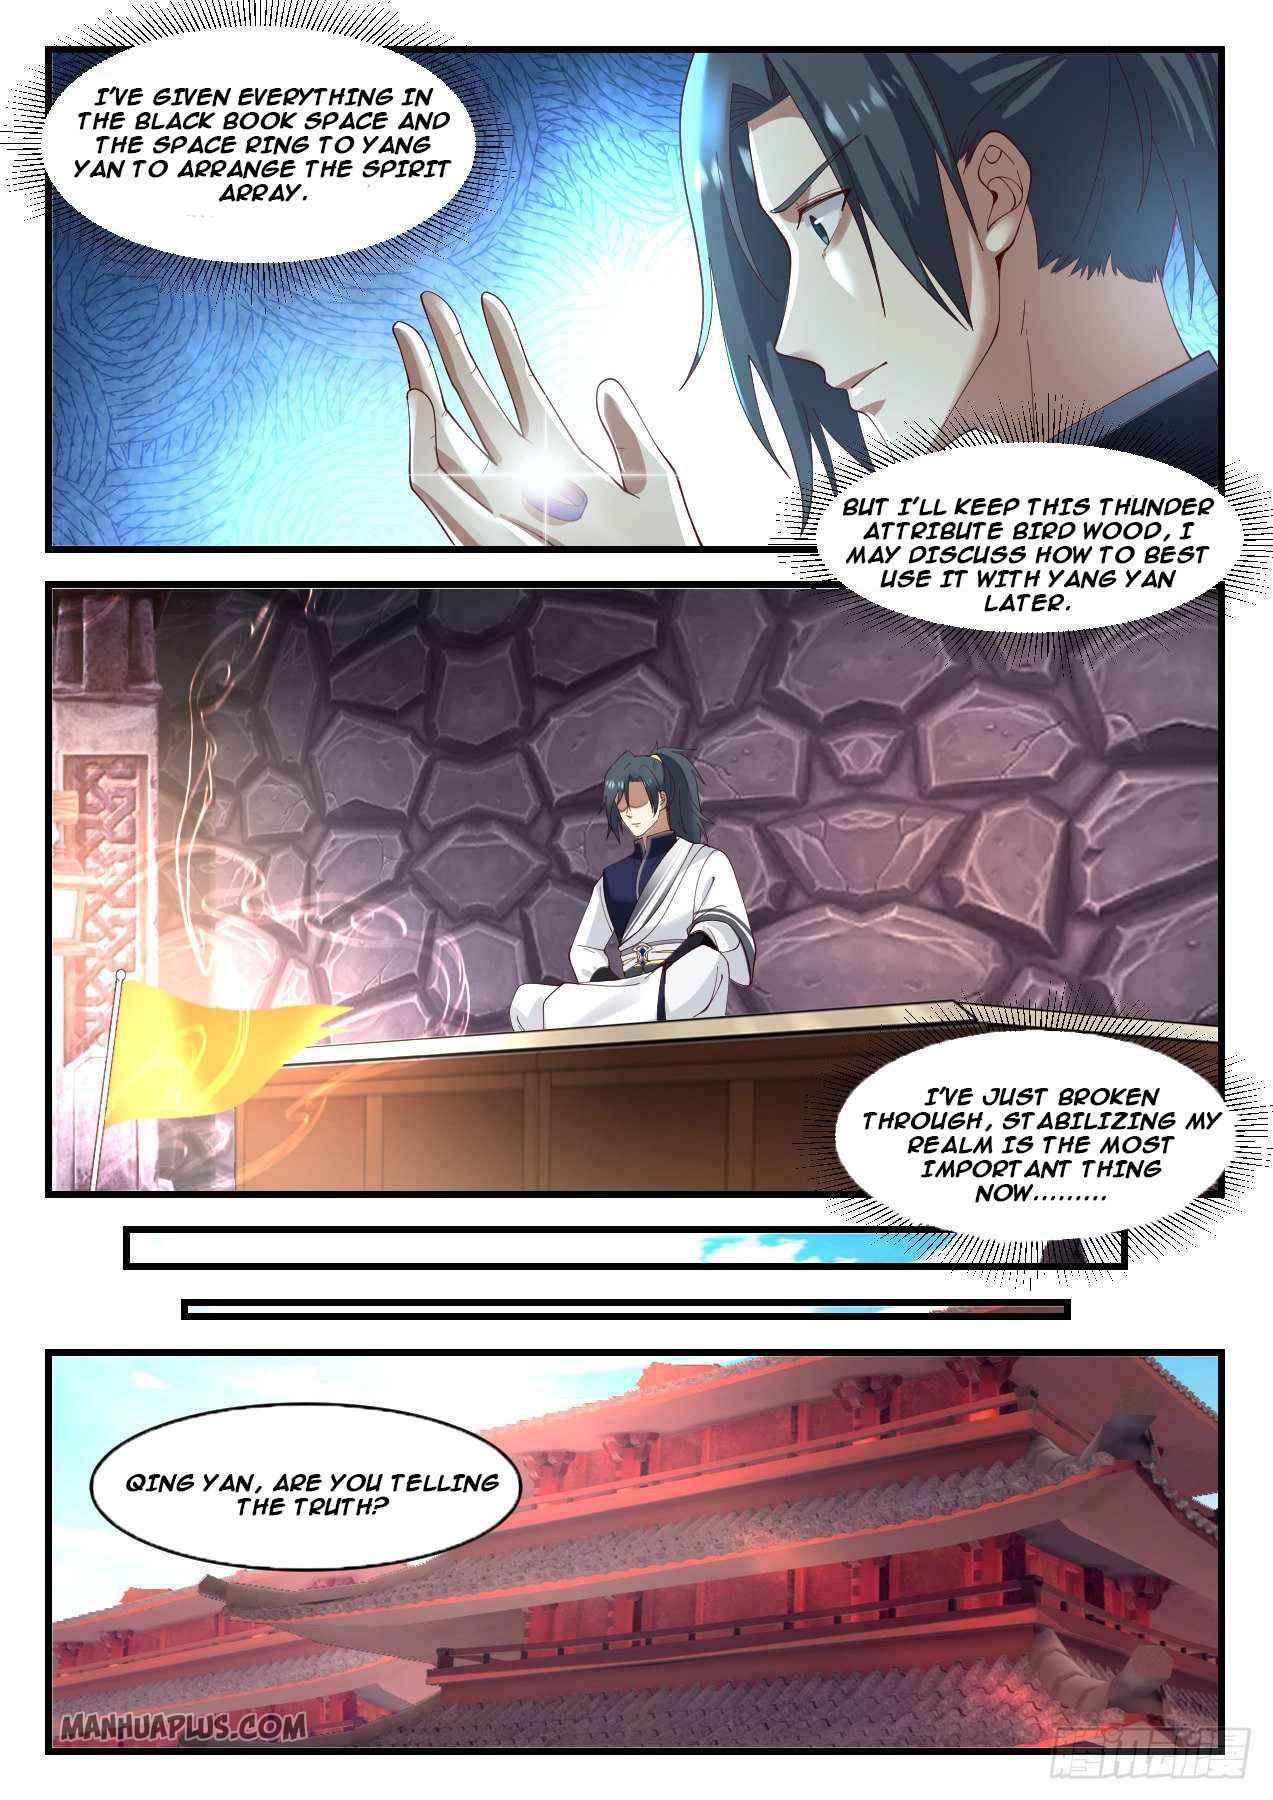 Martial Peak - chapter 1021-eng-li